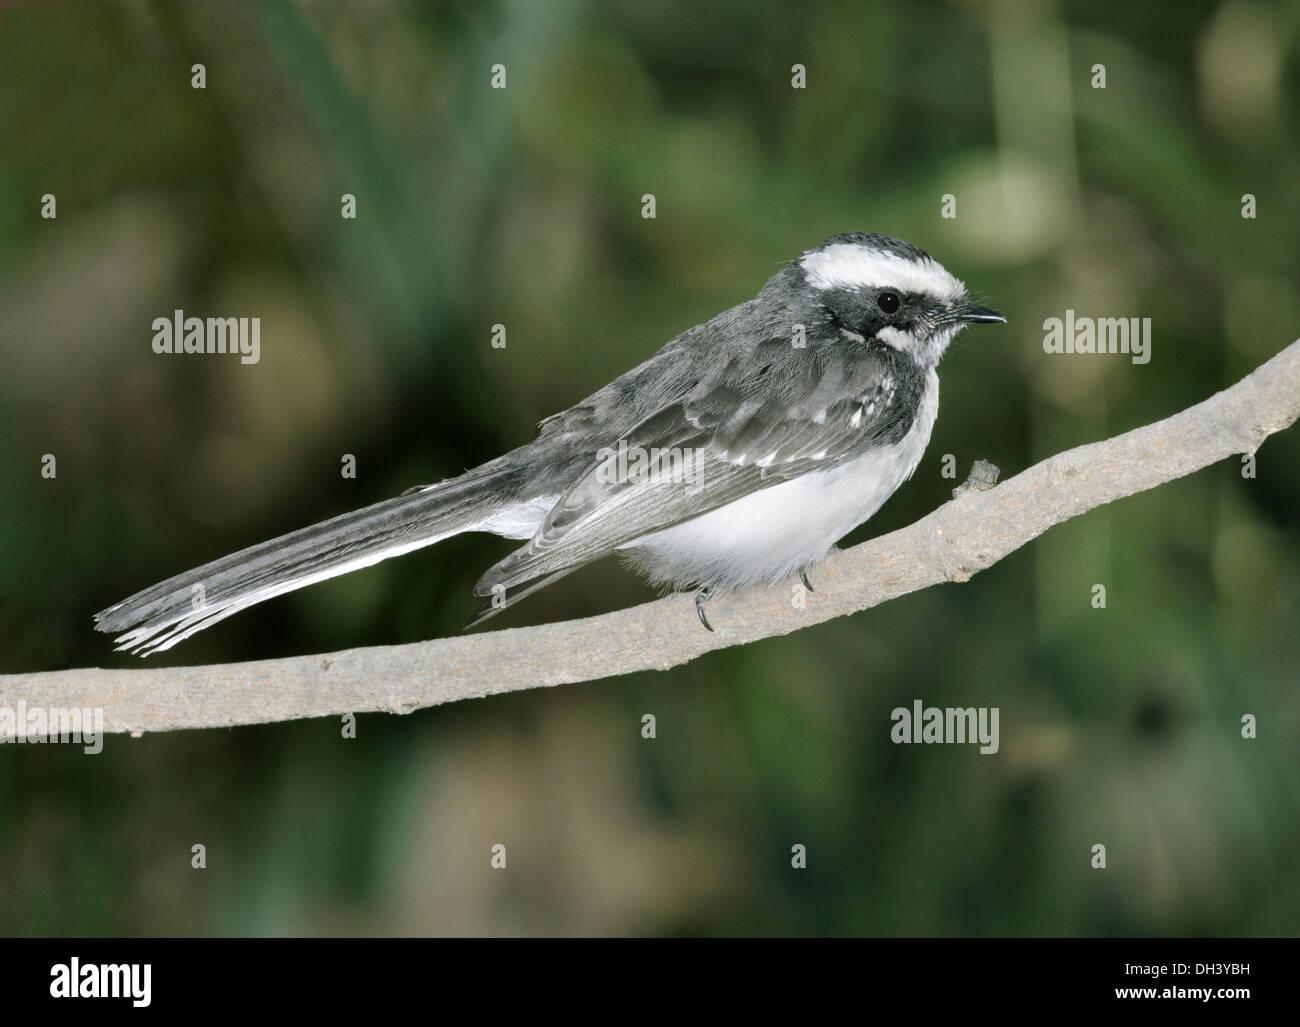 White-browed Fantail - Rhipidura aureola - Stock Image